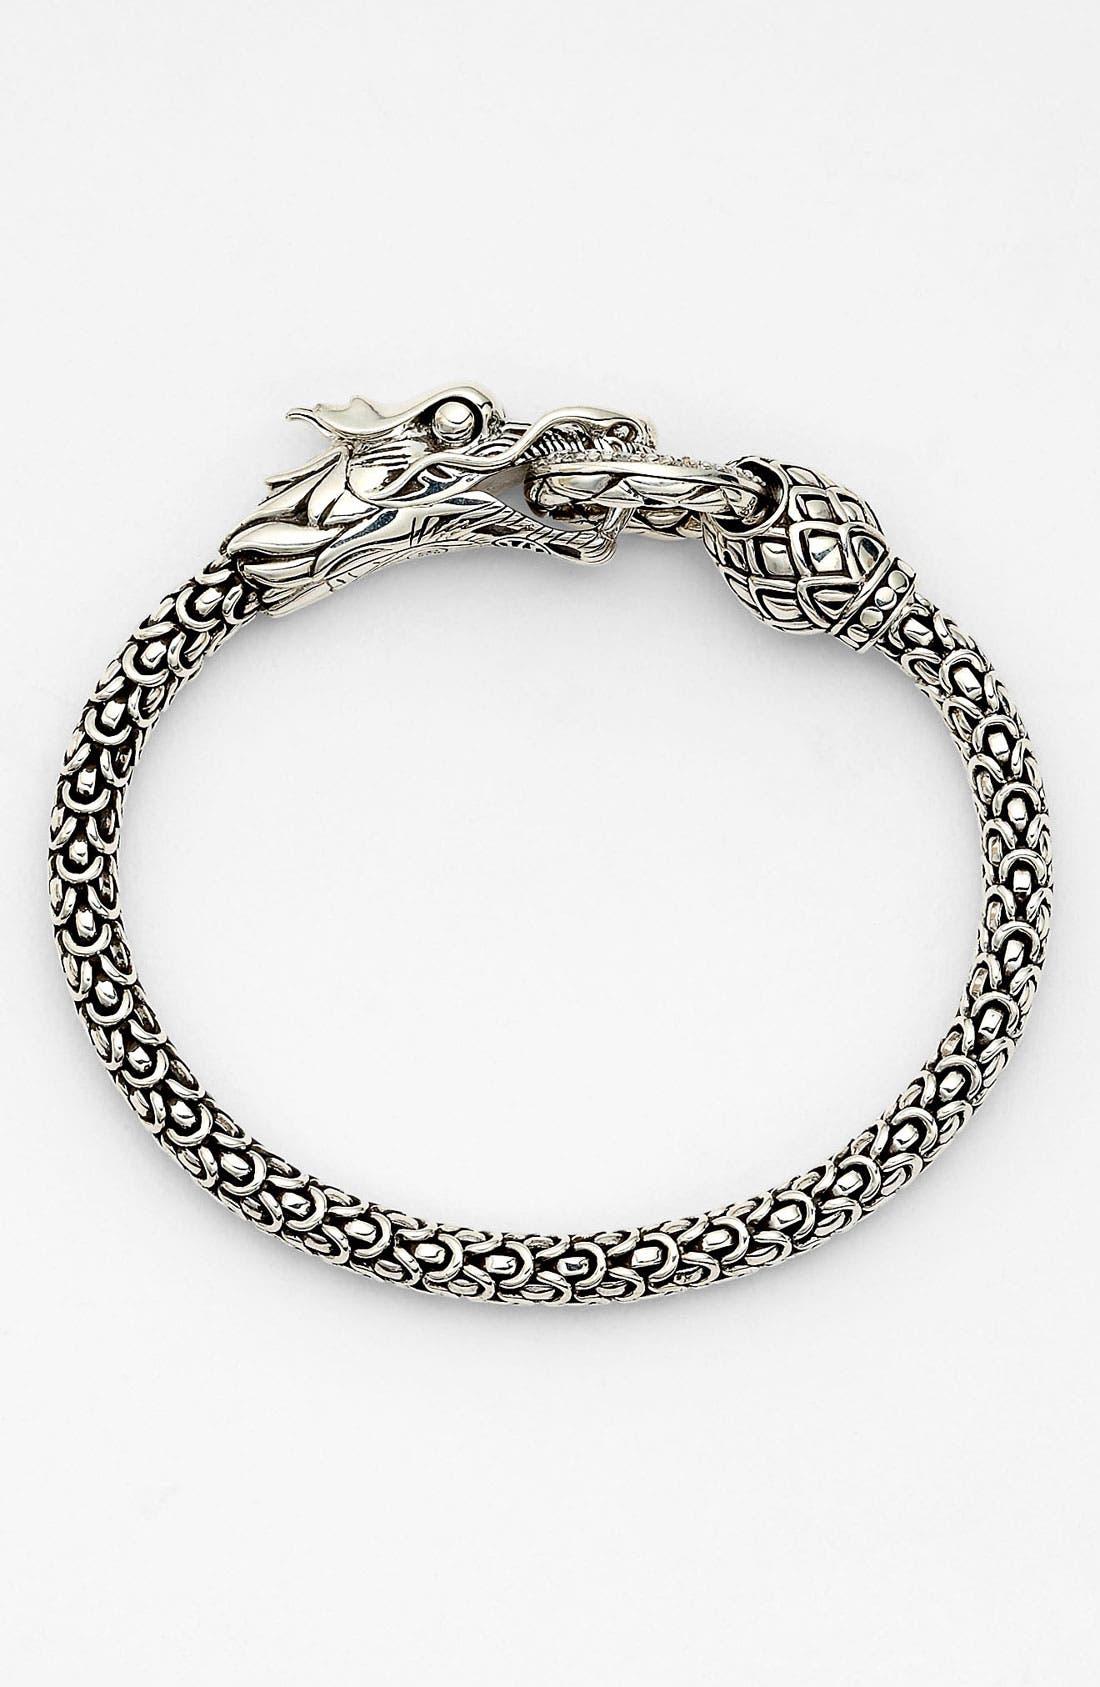 'Naga' Dragon Bracelet,                             Main thumbnail 1, color,                             SILVER/ DIAMOND